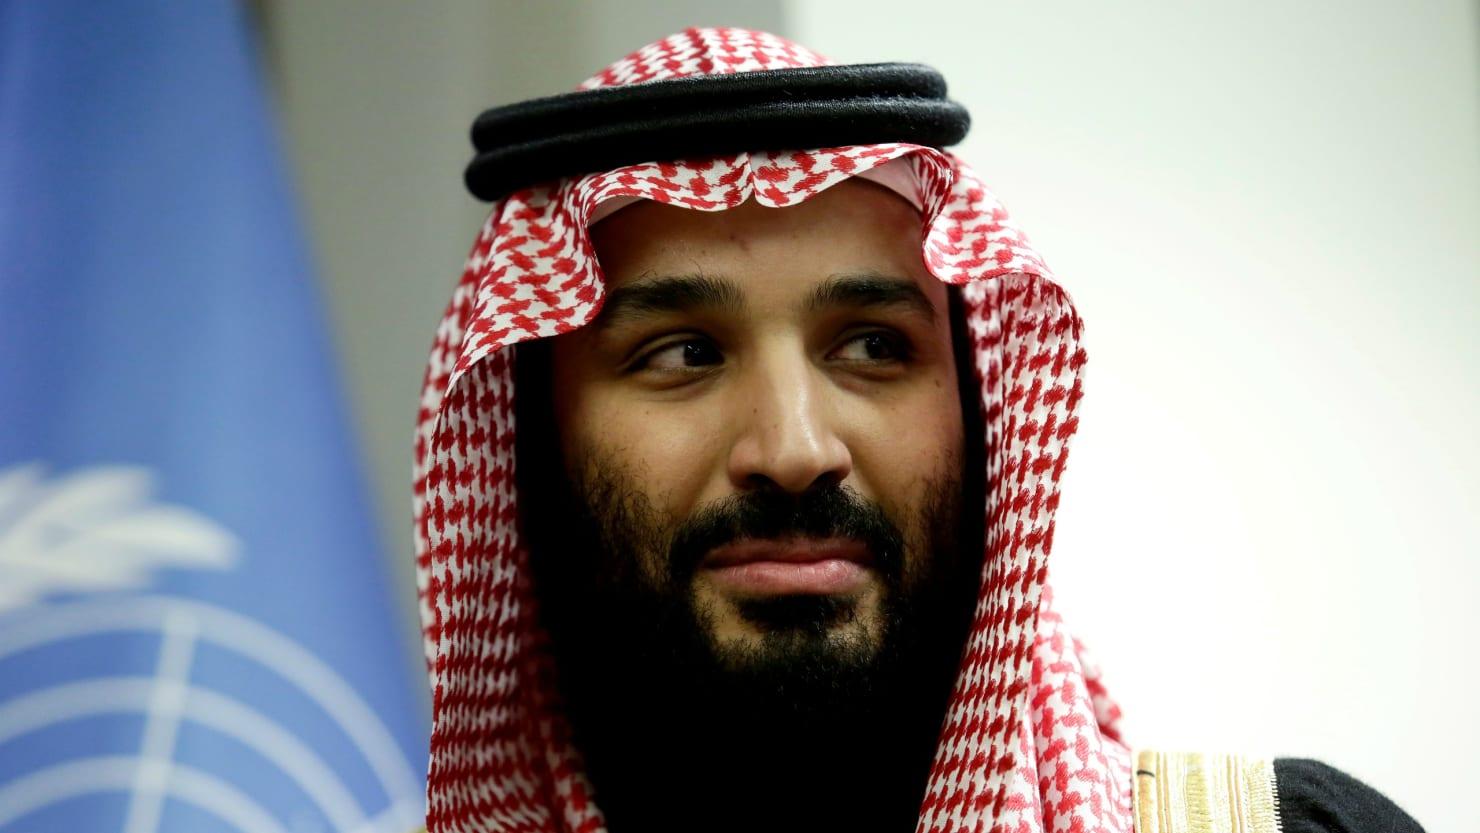 Saudi Prince called Khashoggi a dangerous Islamist